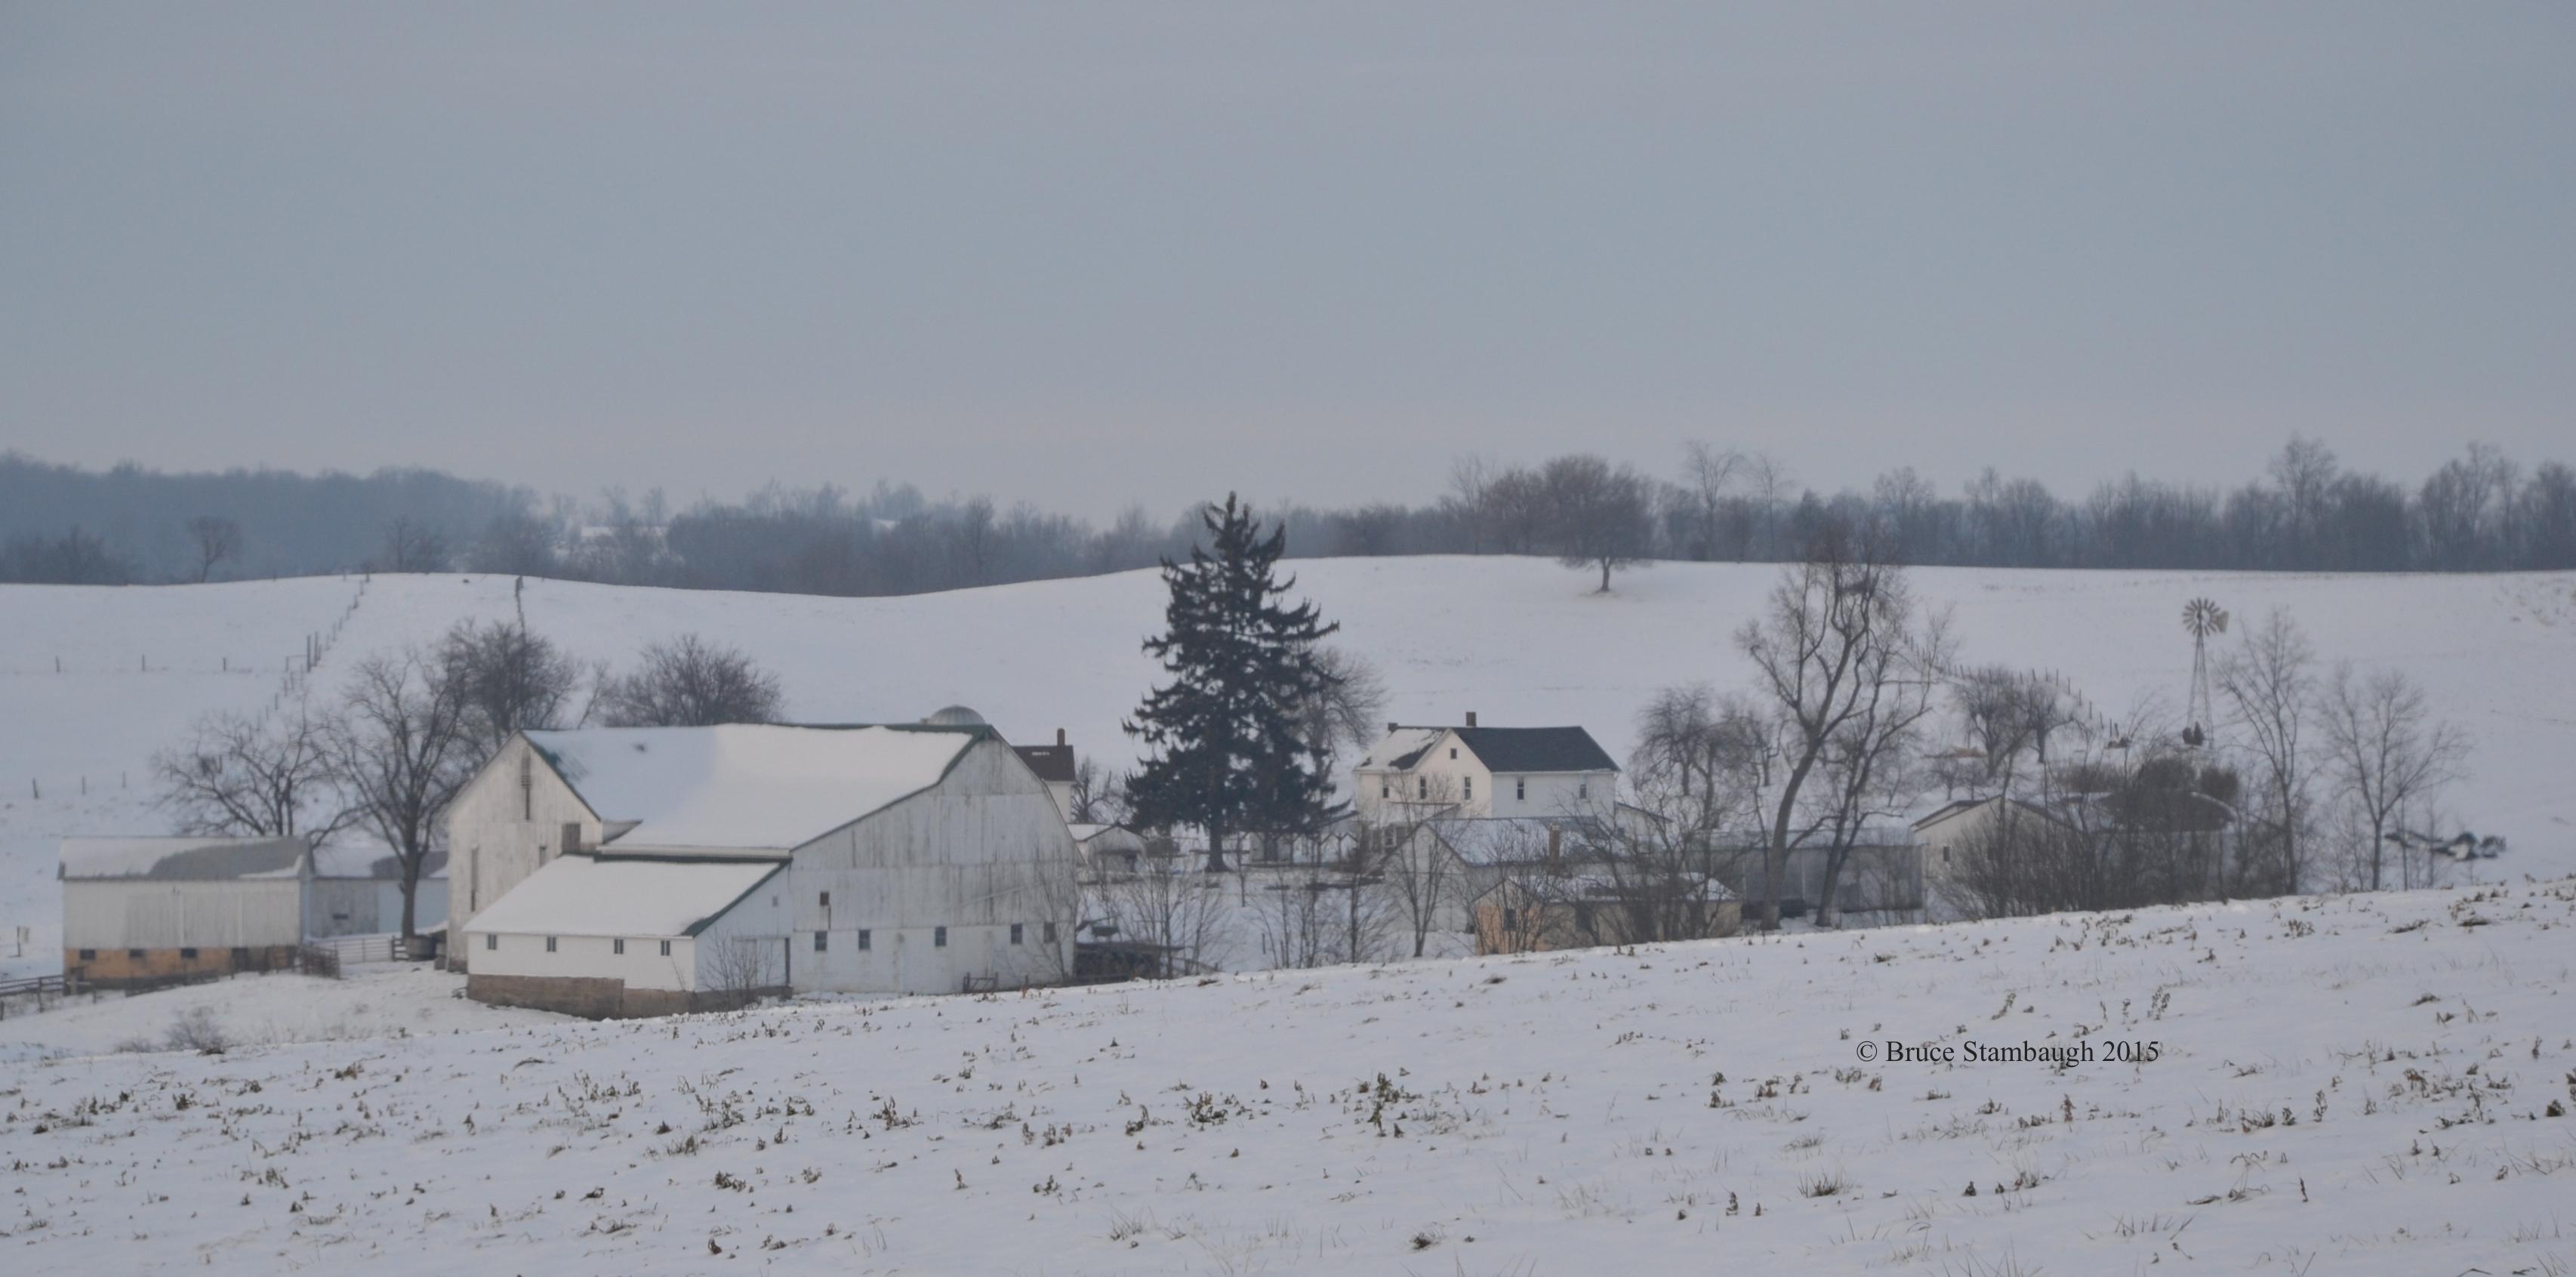 Amish farm, fresh snow, rural landscape